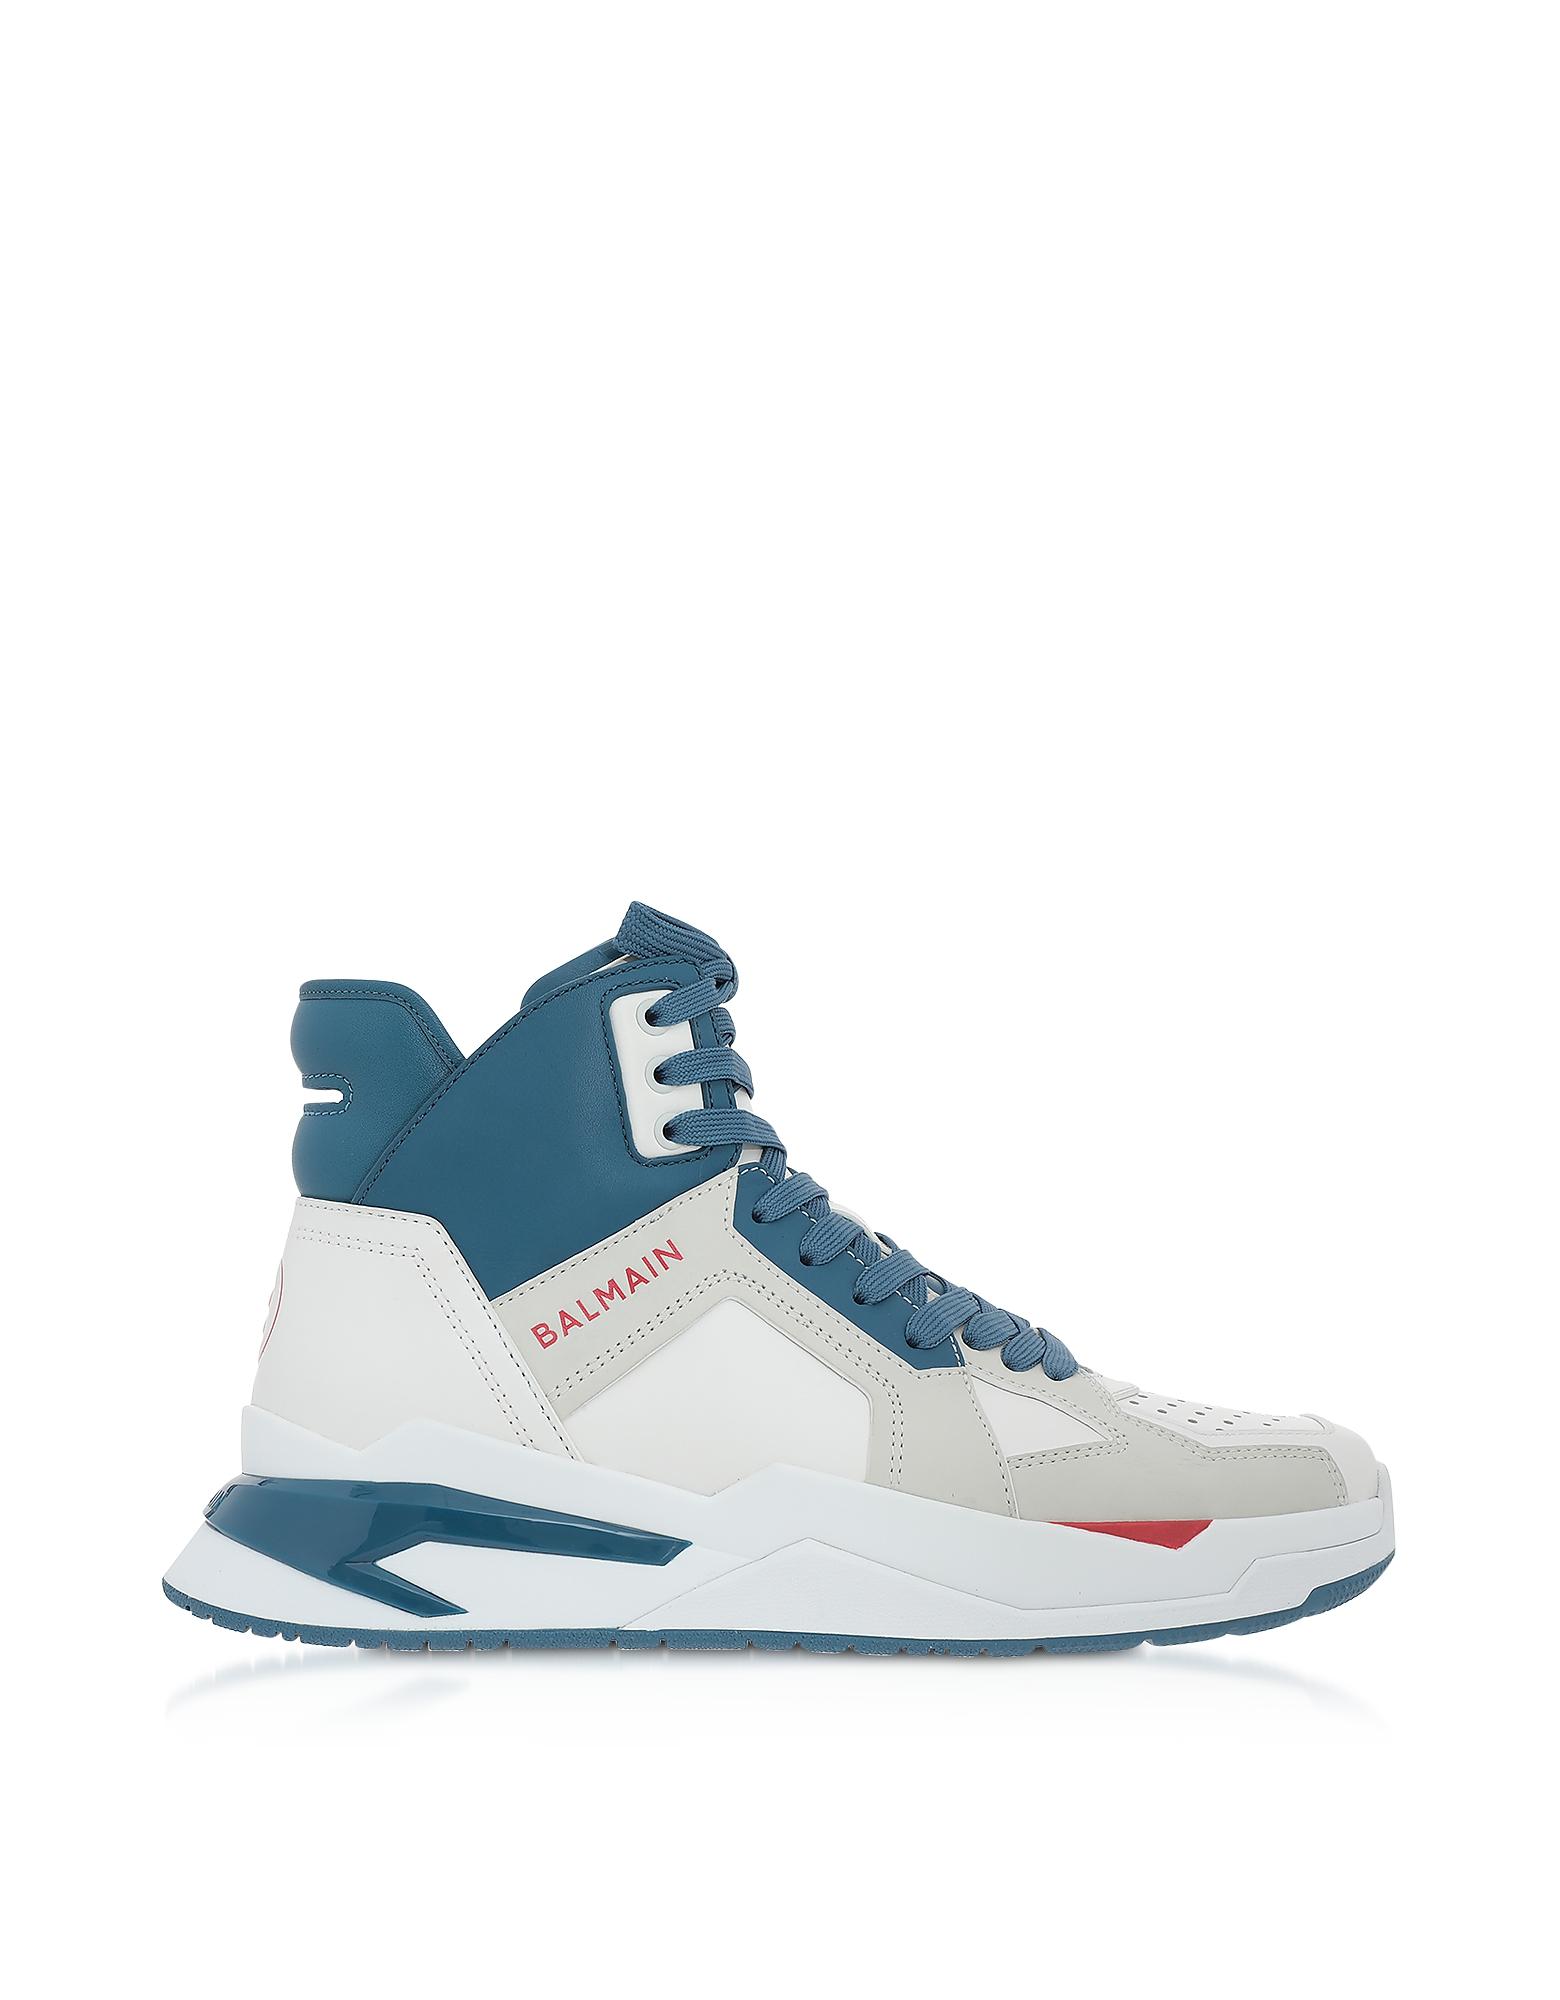 White & Blue High Top Men's B-Ball Sneakers